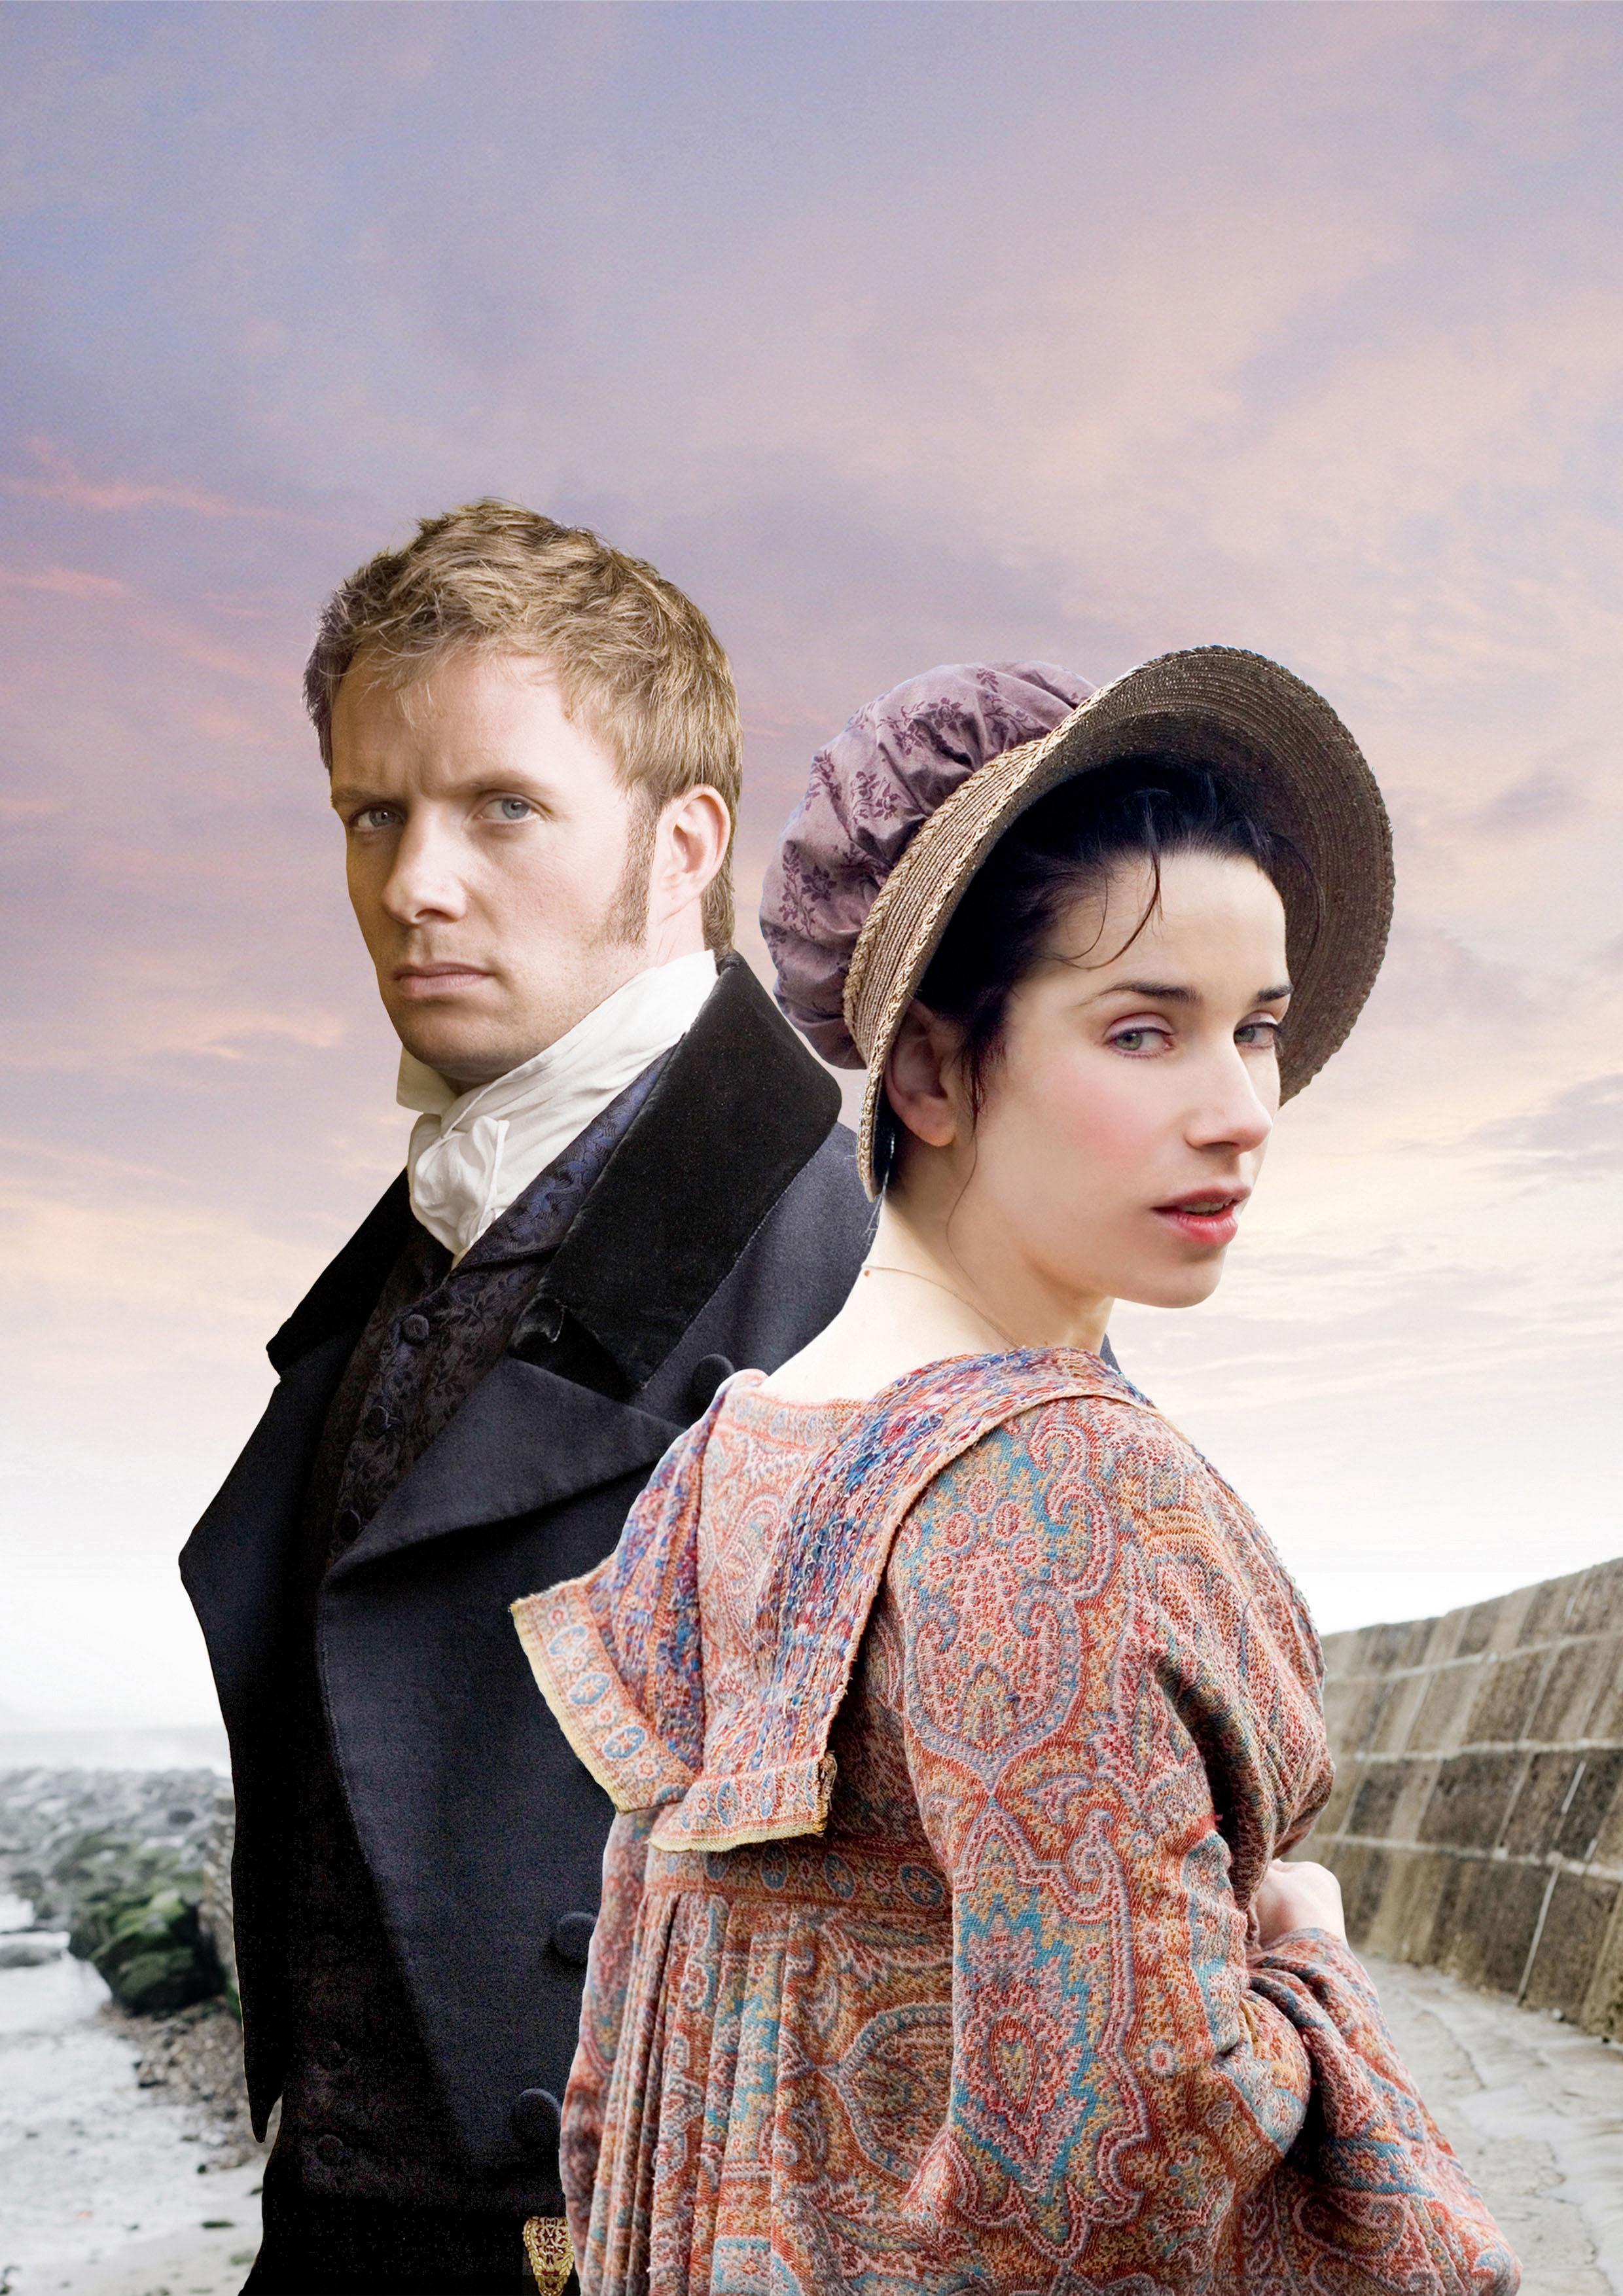 http://period-films.narod.ru/1775_Jane_Austen/Persuasion_2007/001.jpg